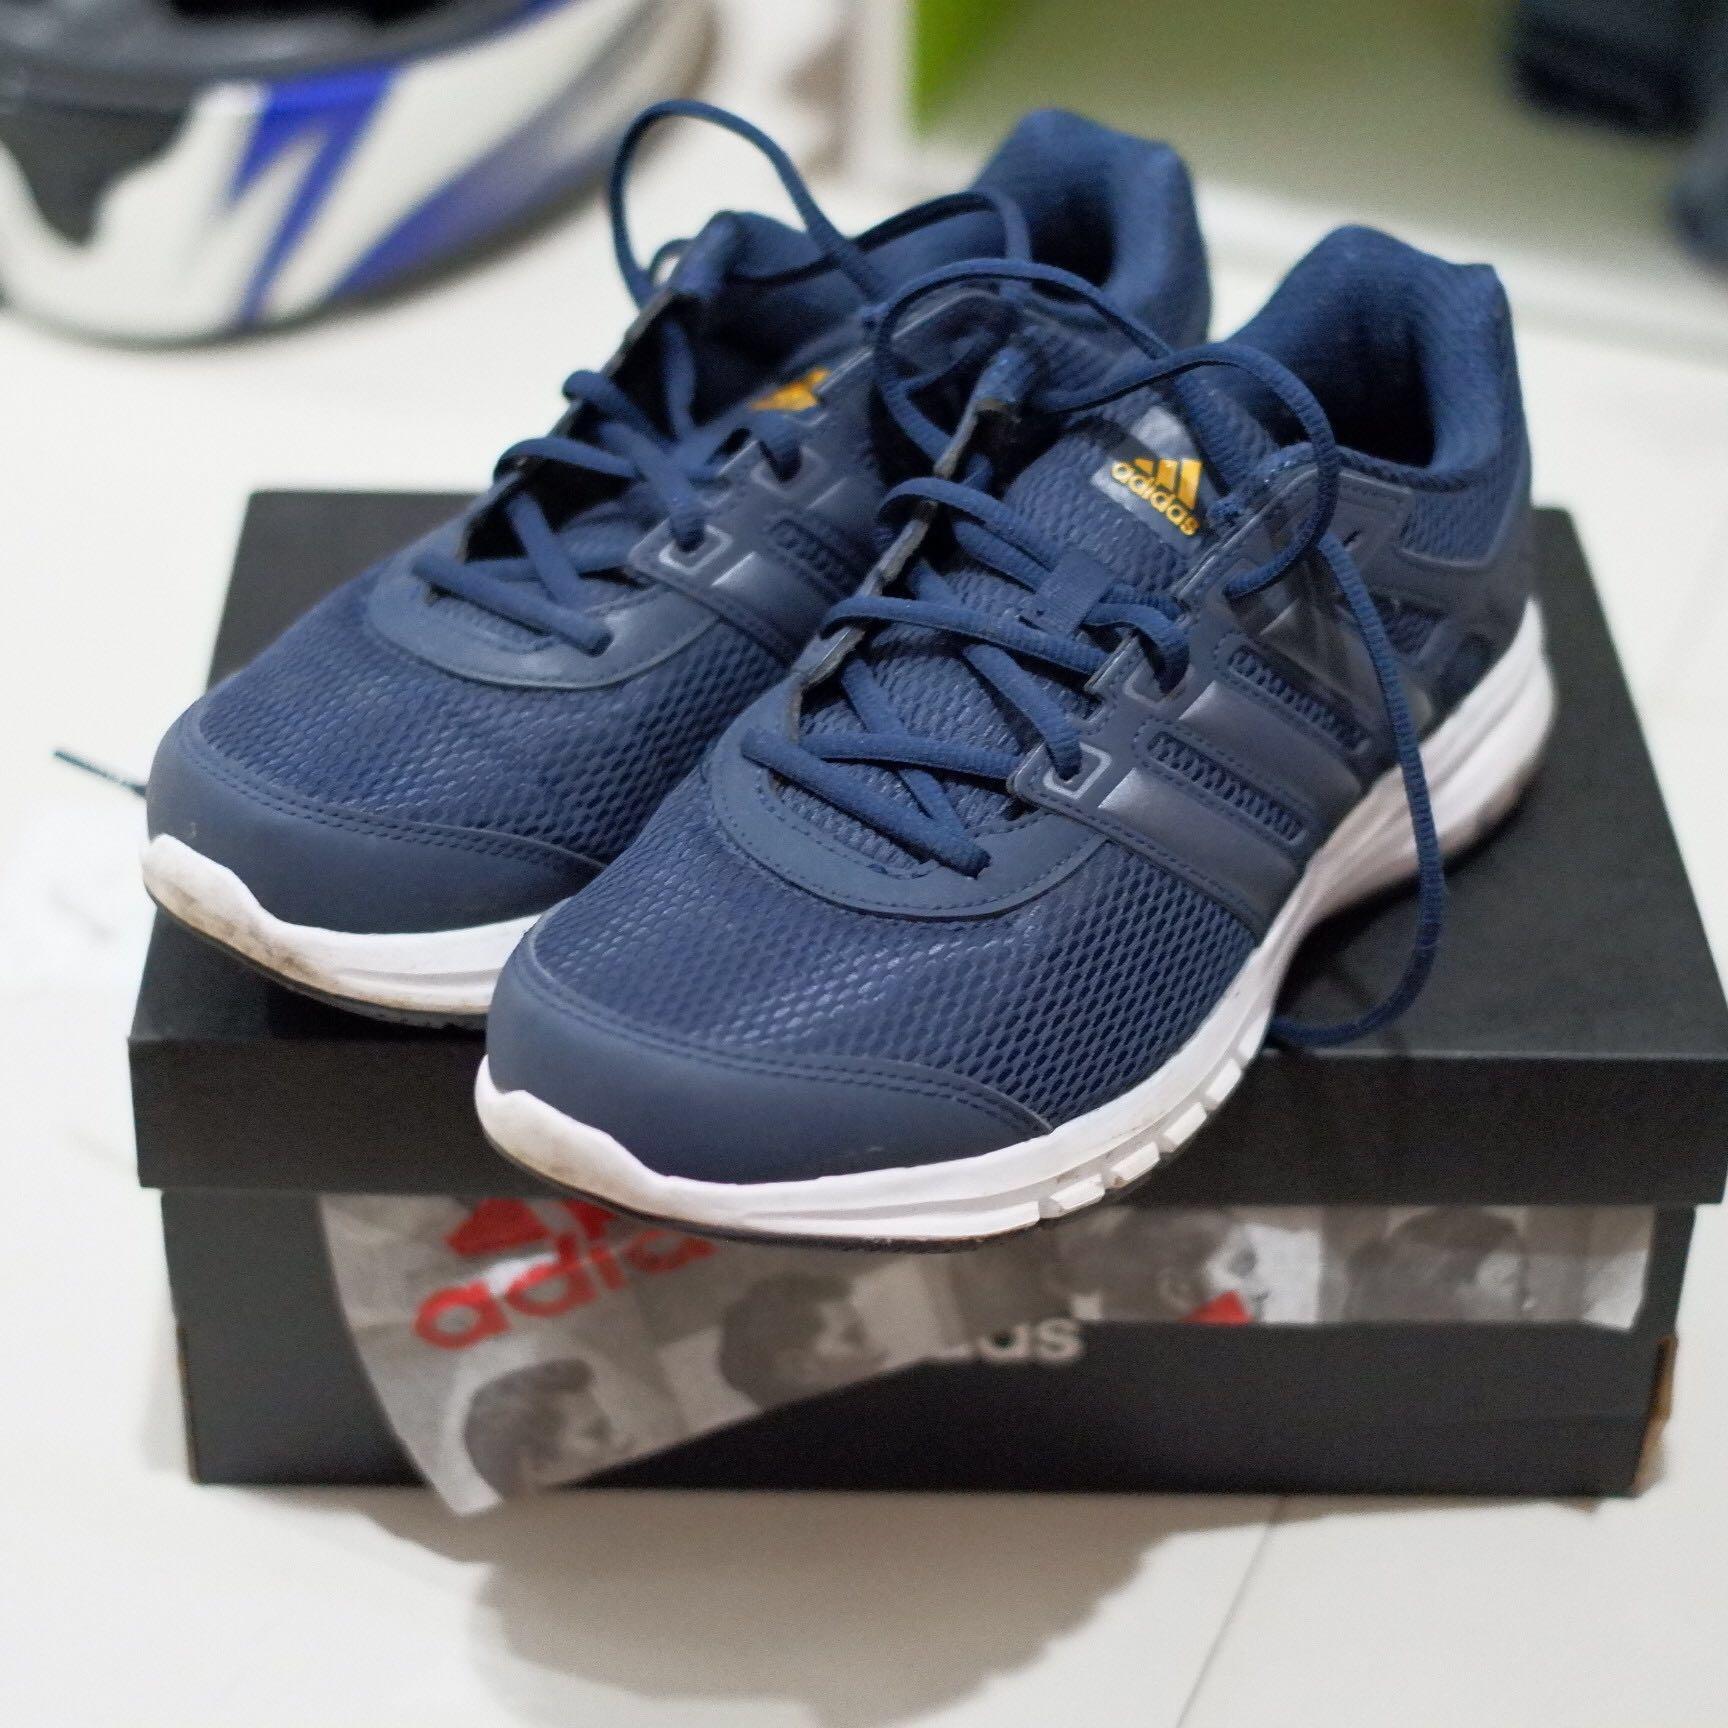 Sale Sepatu Adidas Running Men S Fashion Men S Footwear On Carousell d01c1660af